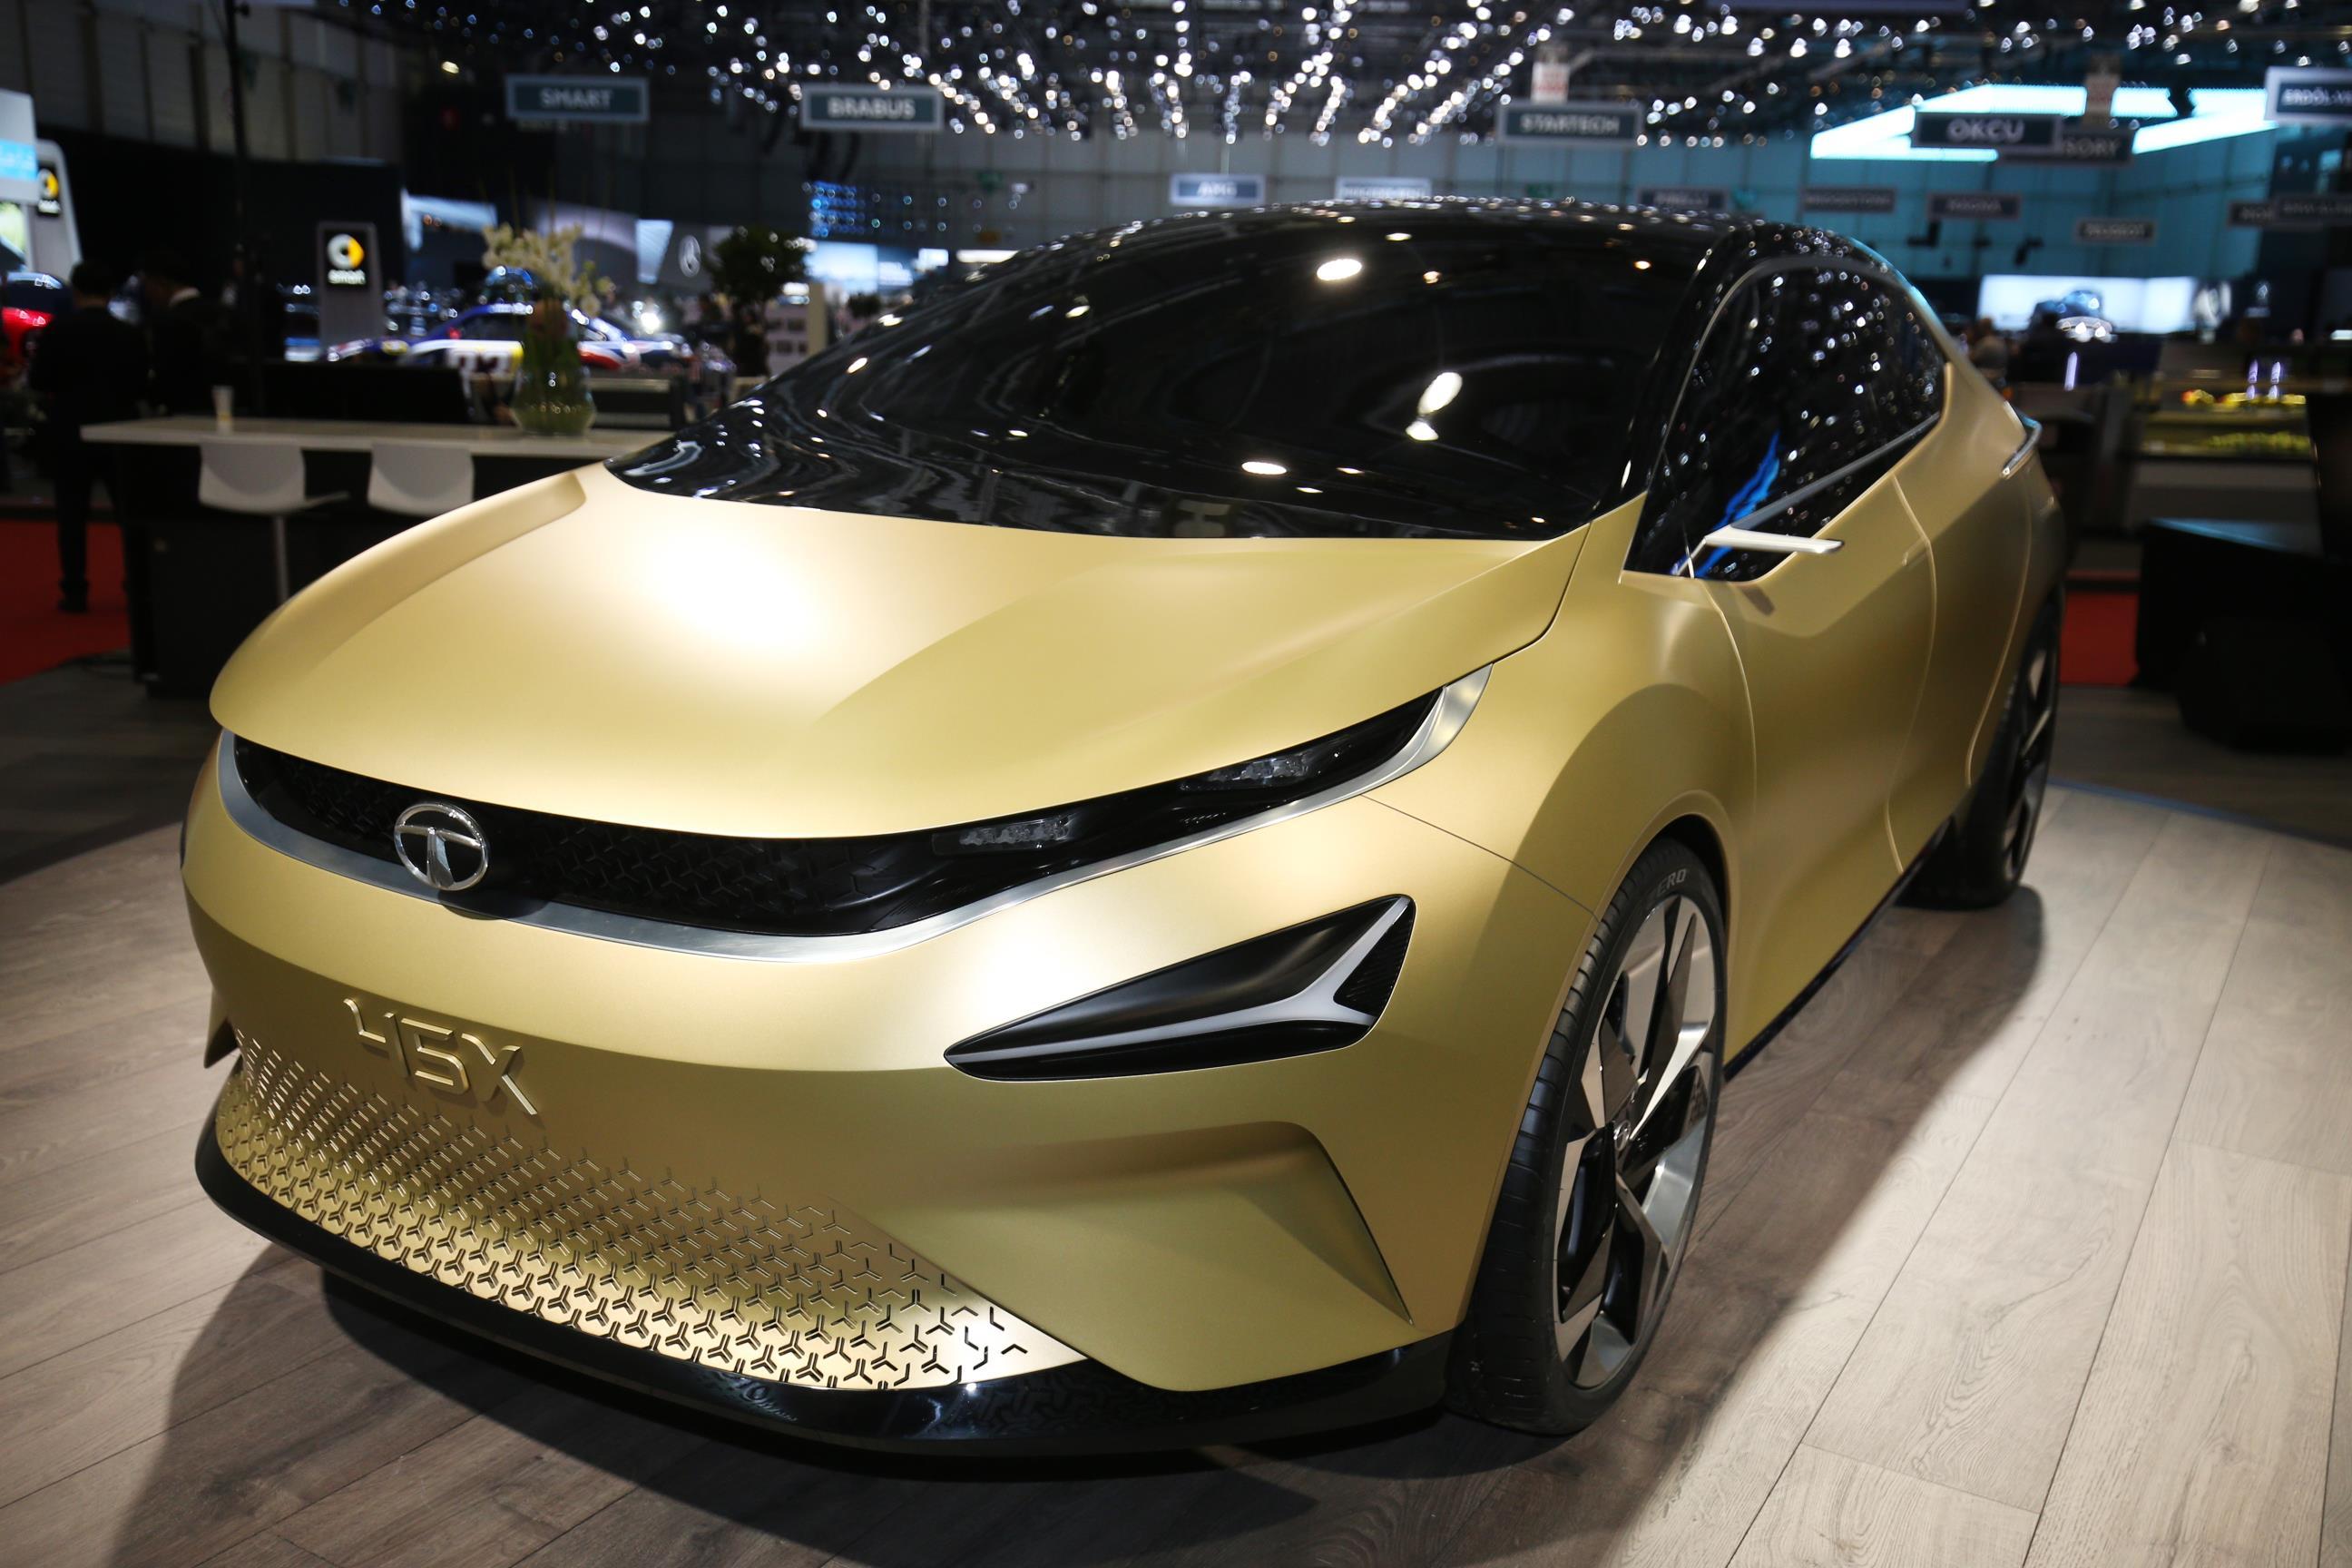 Geneva Motor Show 2018 Mega Gallery Part 2 (182)